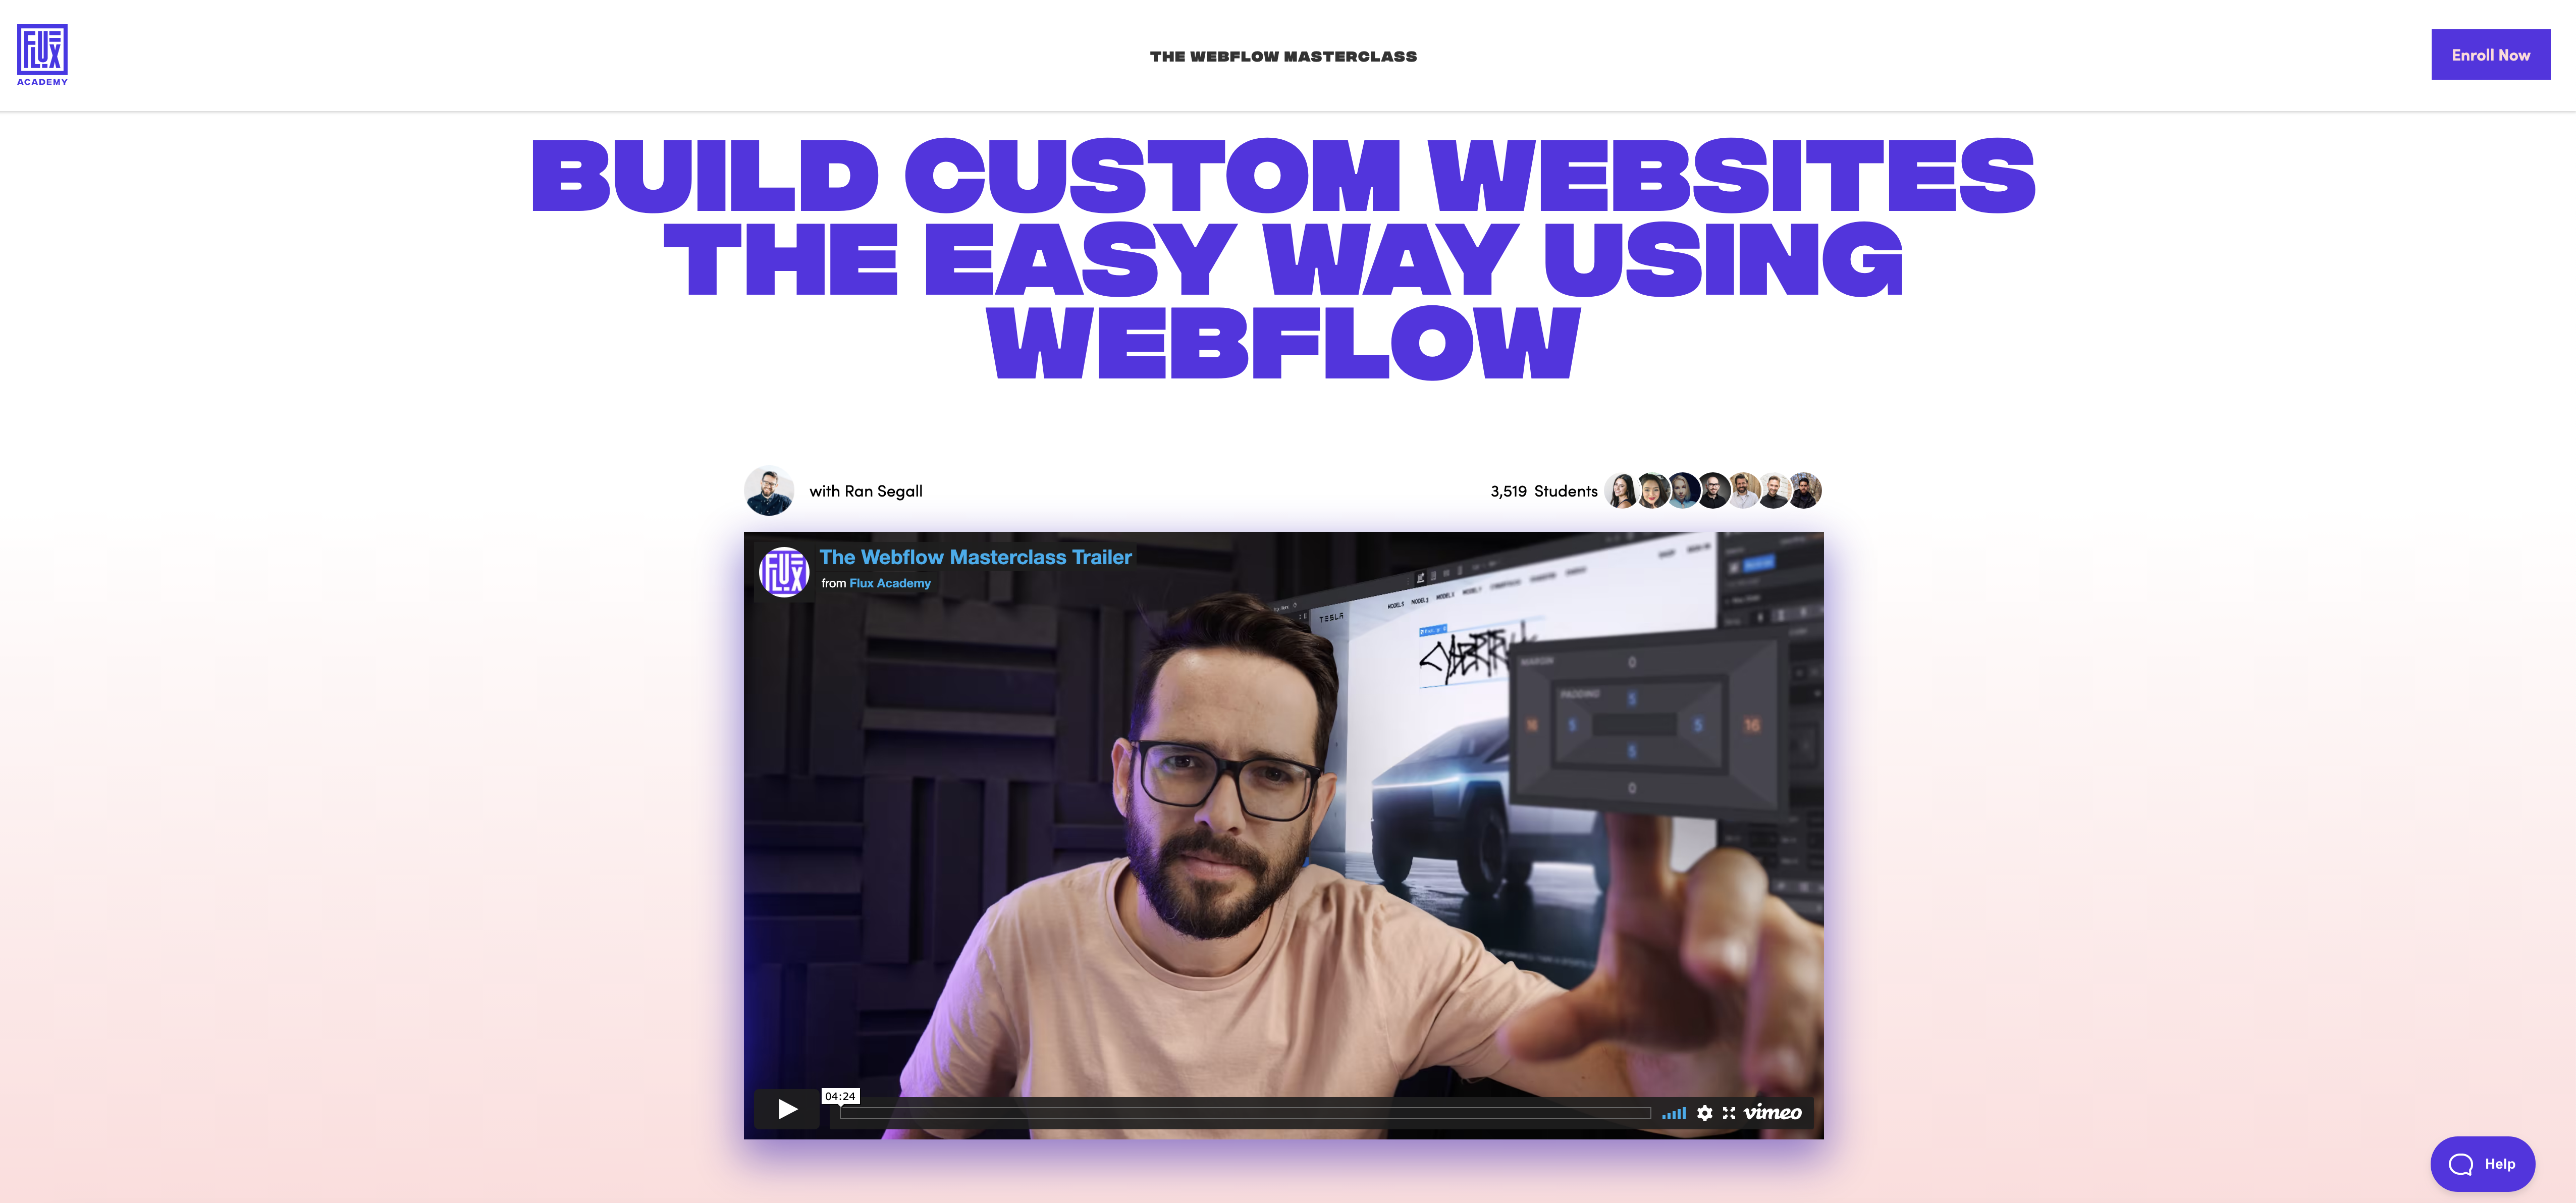 The Webflow Masterclass